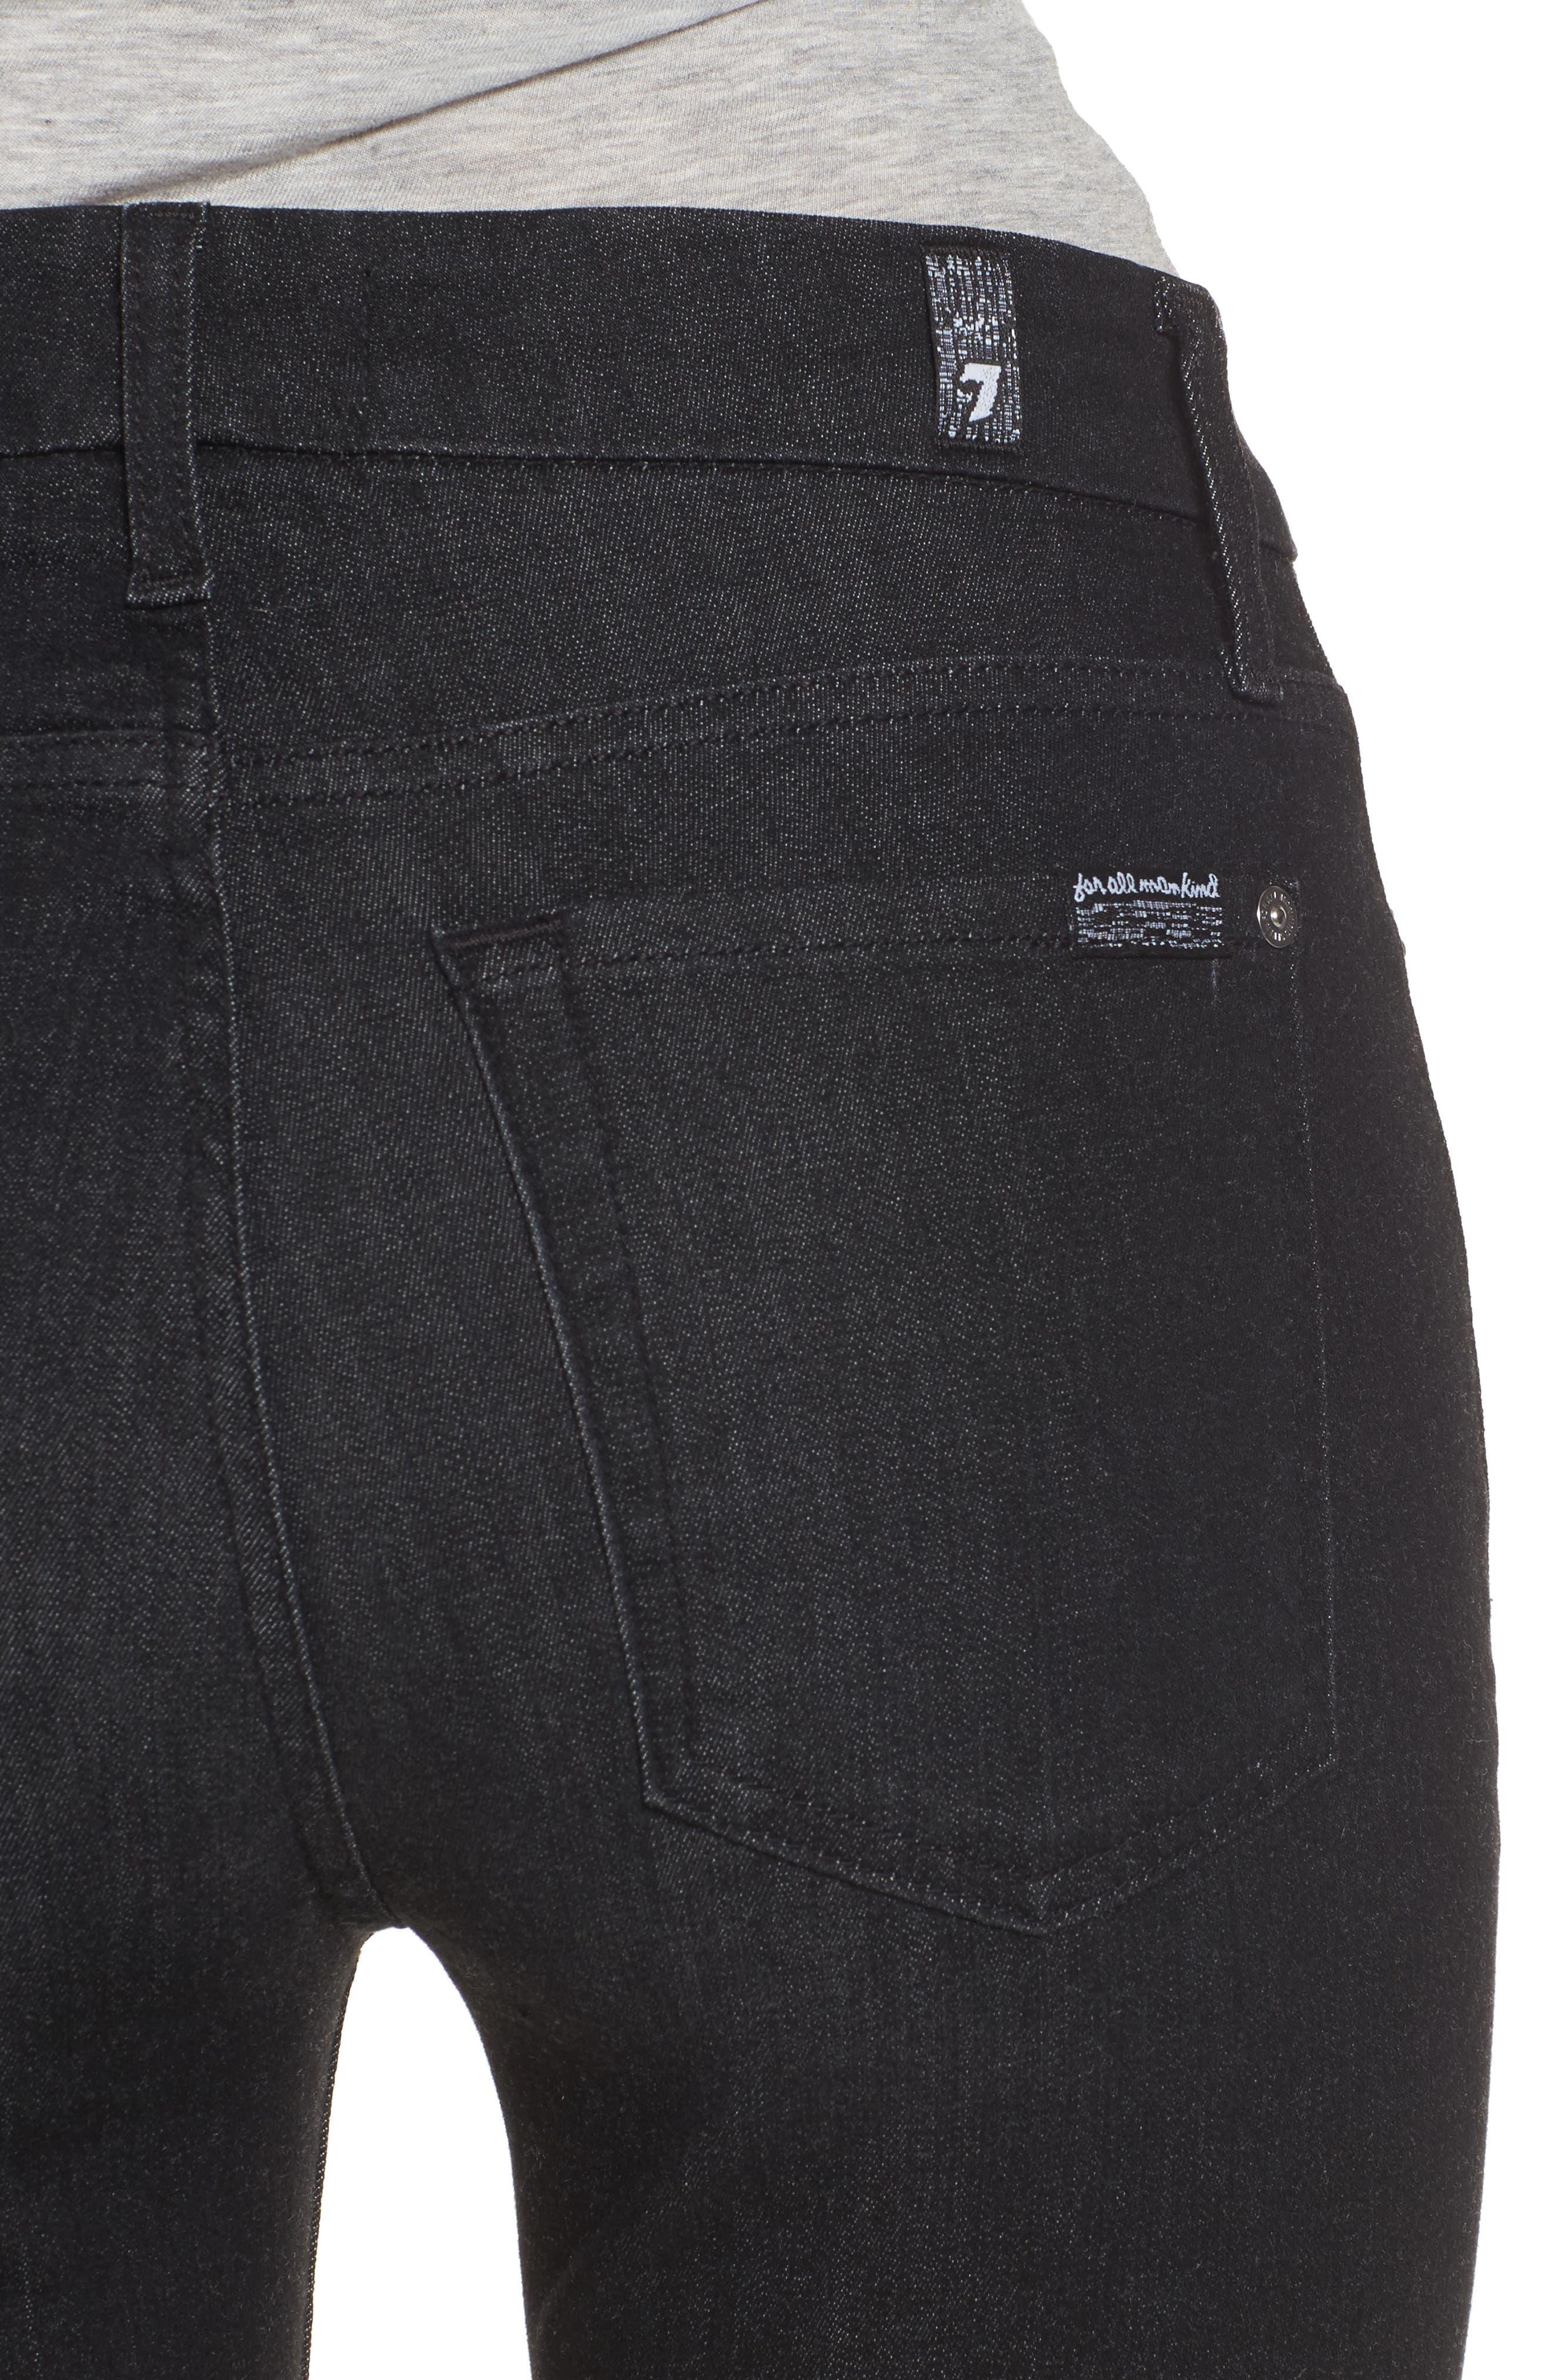 b(air) - The Skinny High Waist Jeans,                             Alternate thumbnail 4, color,                             Bair Noir